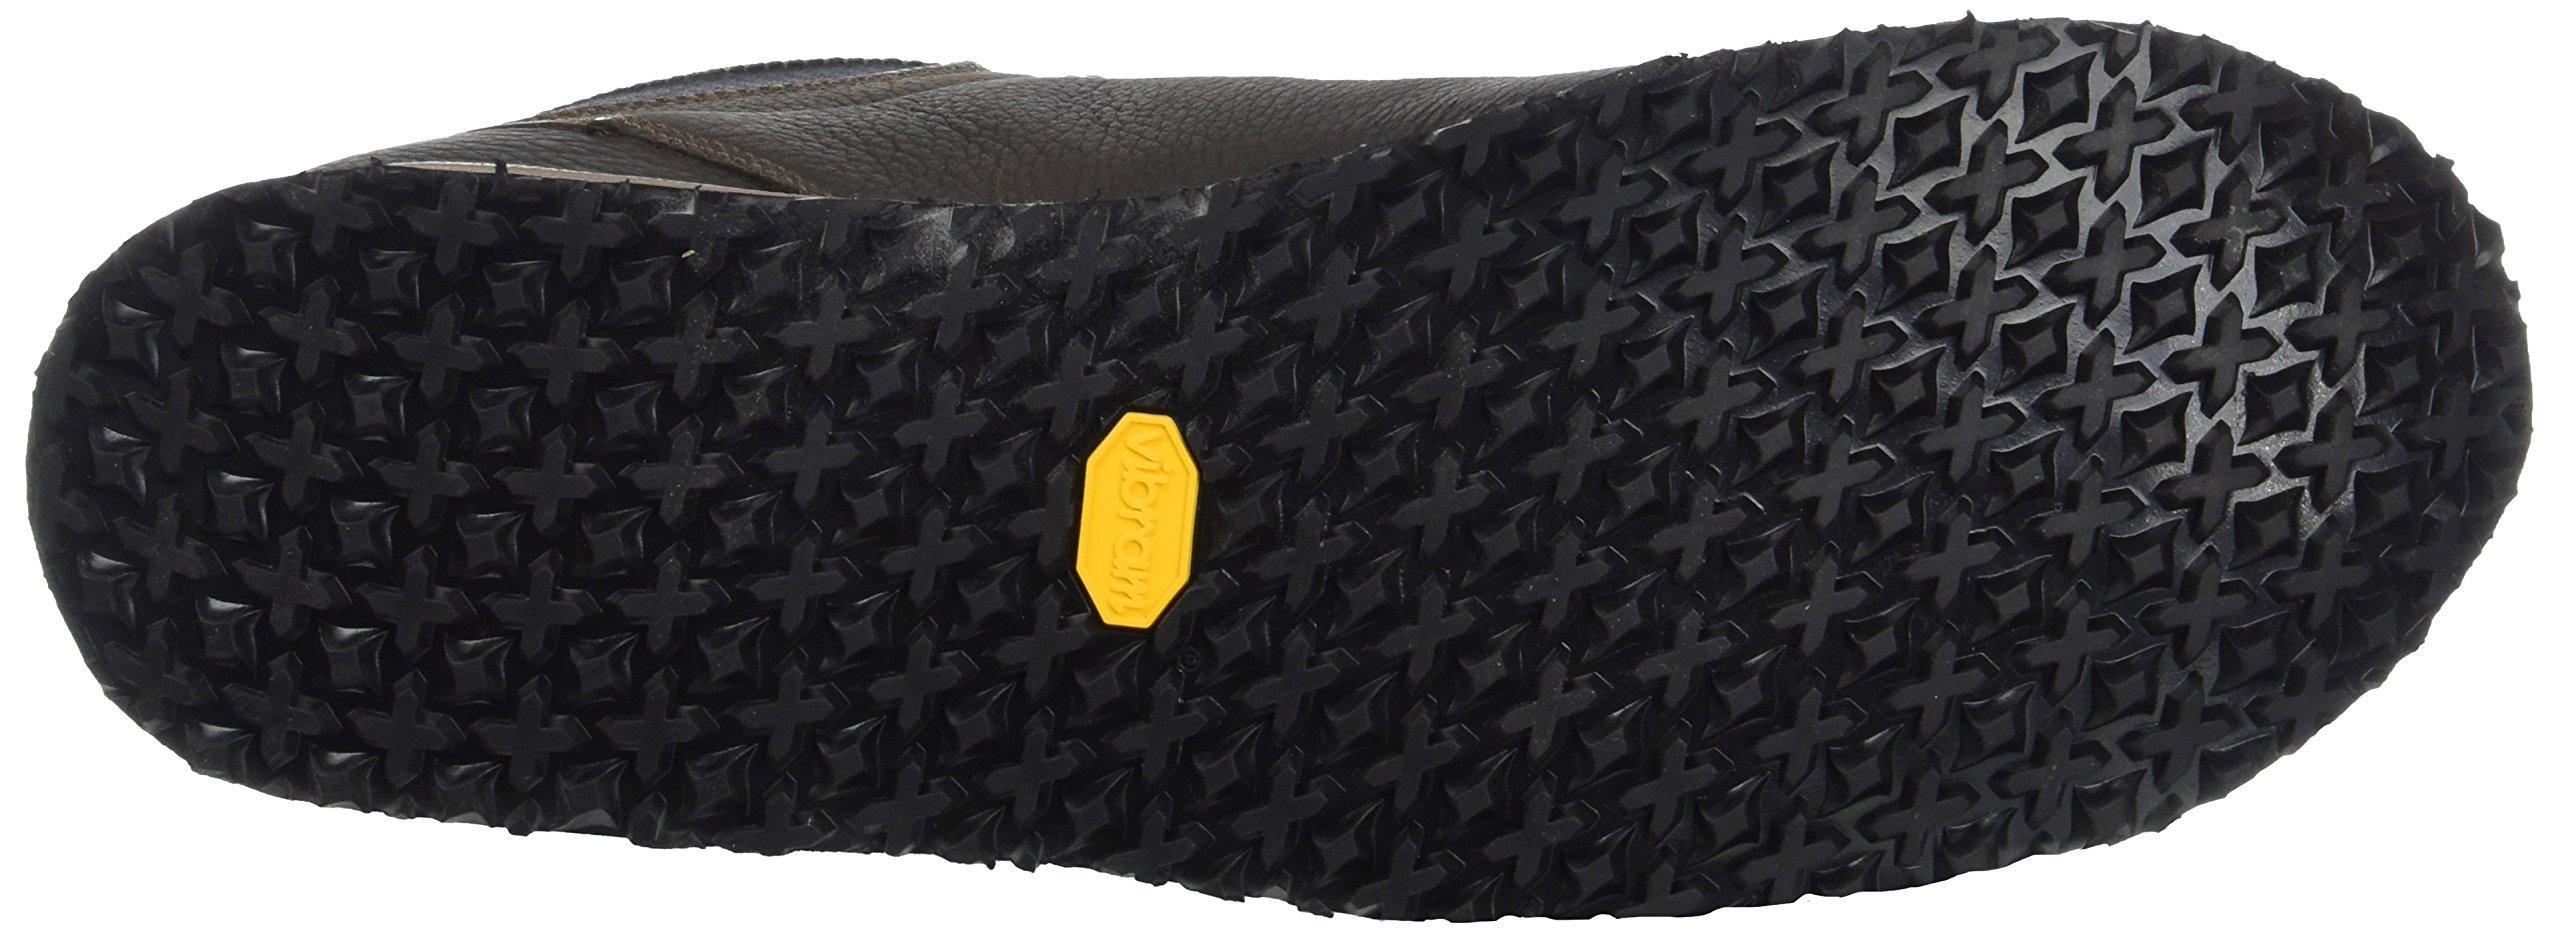 815yzTumQeL - AKU Unisex Adults' Badia Plus High Rise Hiking Boots